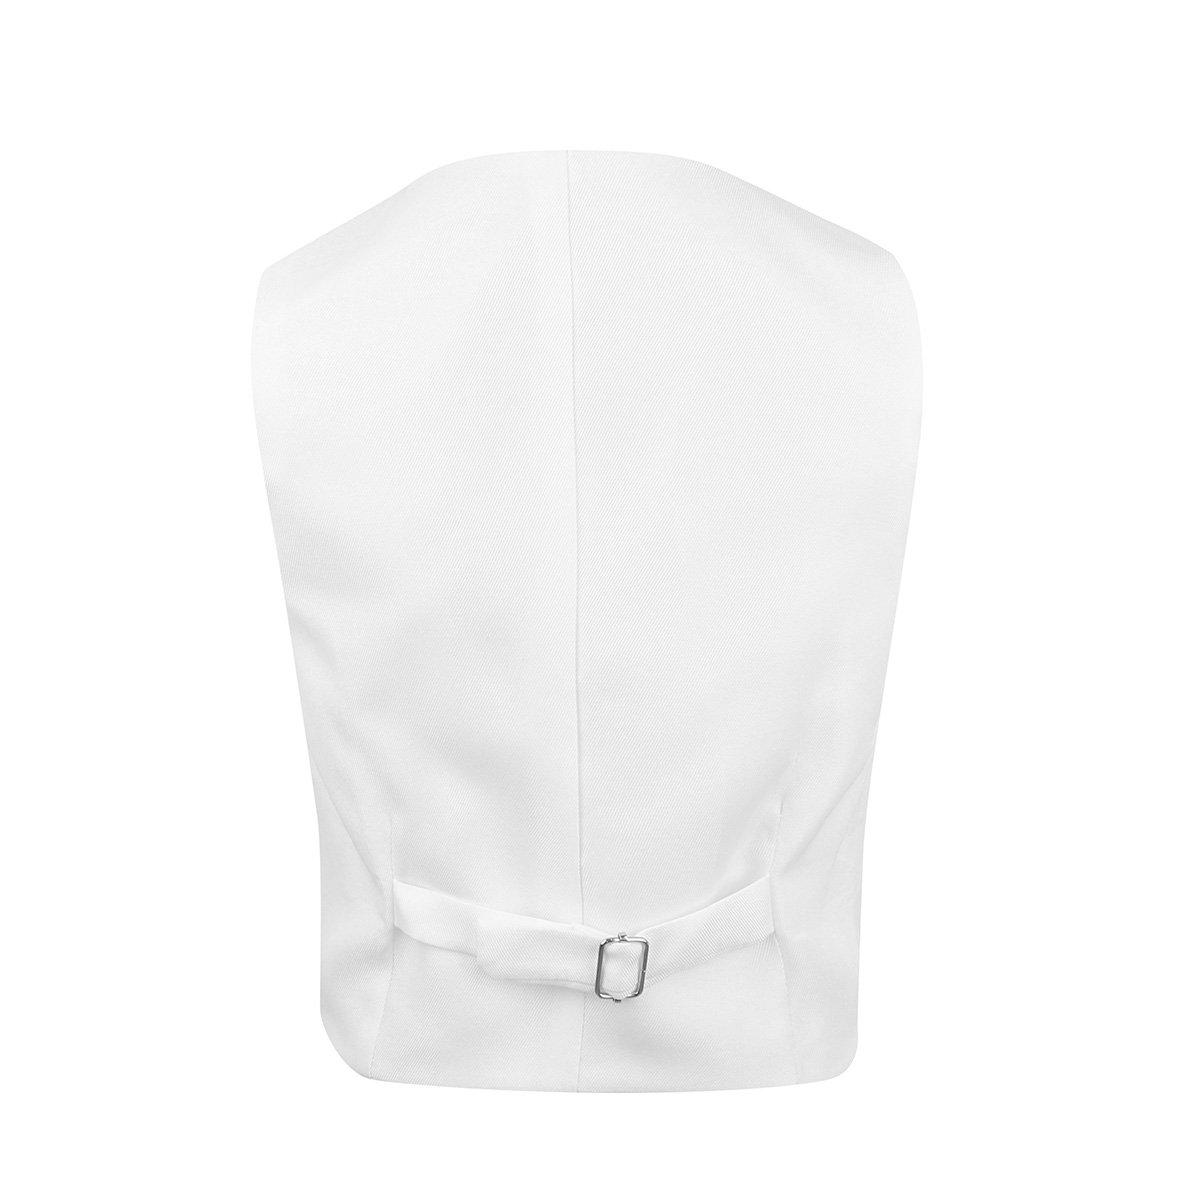 dPois Kids Boys Wedding Formal Waistcoat Gentleman Suits Floral Pattern Vest